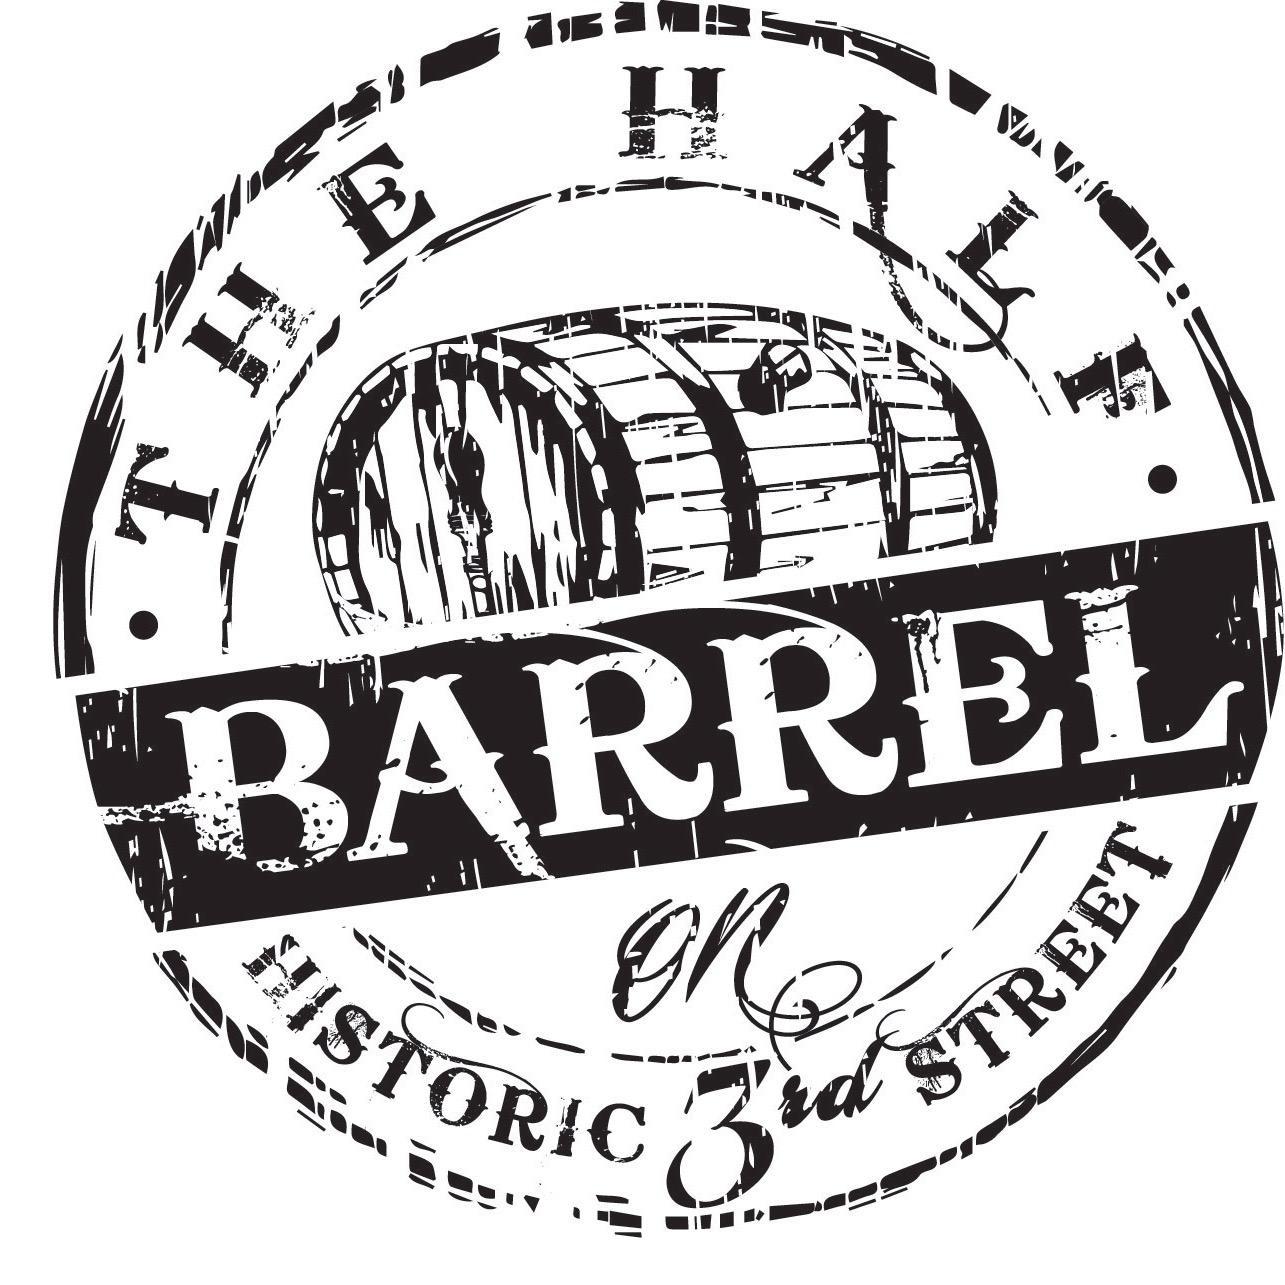 Half_Barrell.jpeg